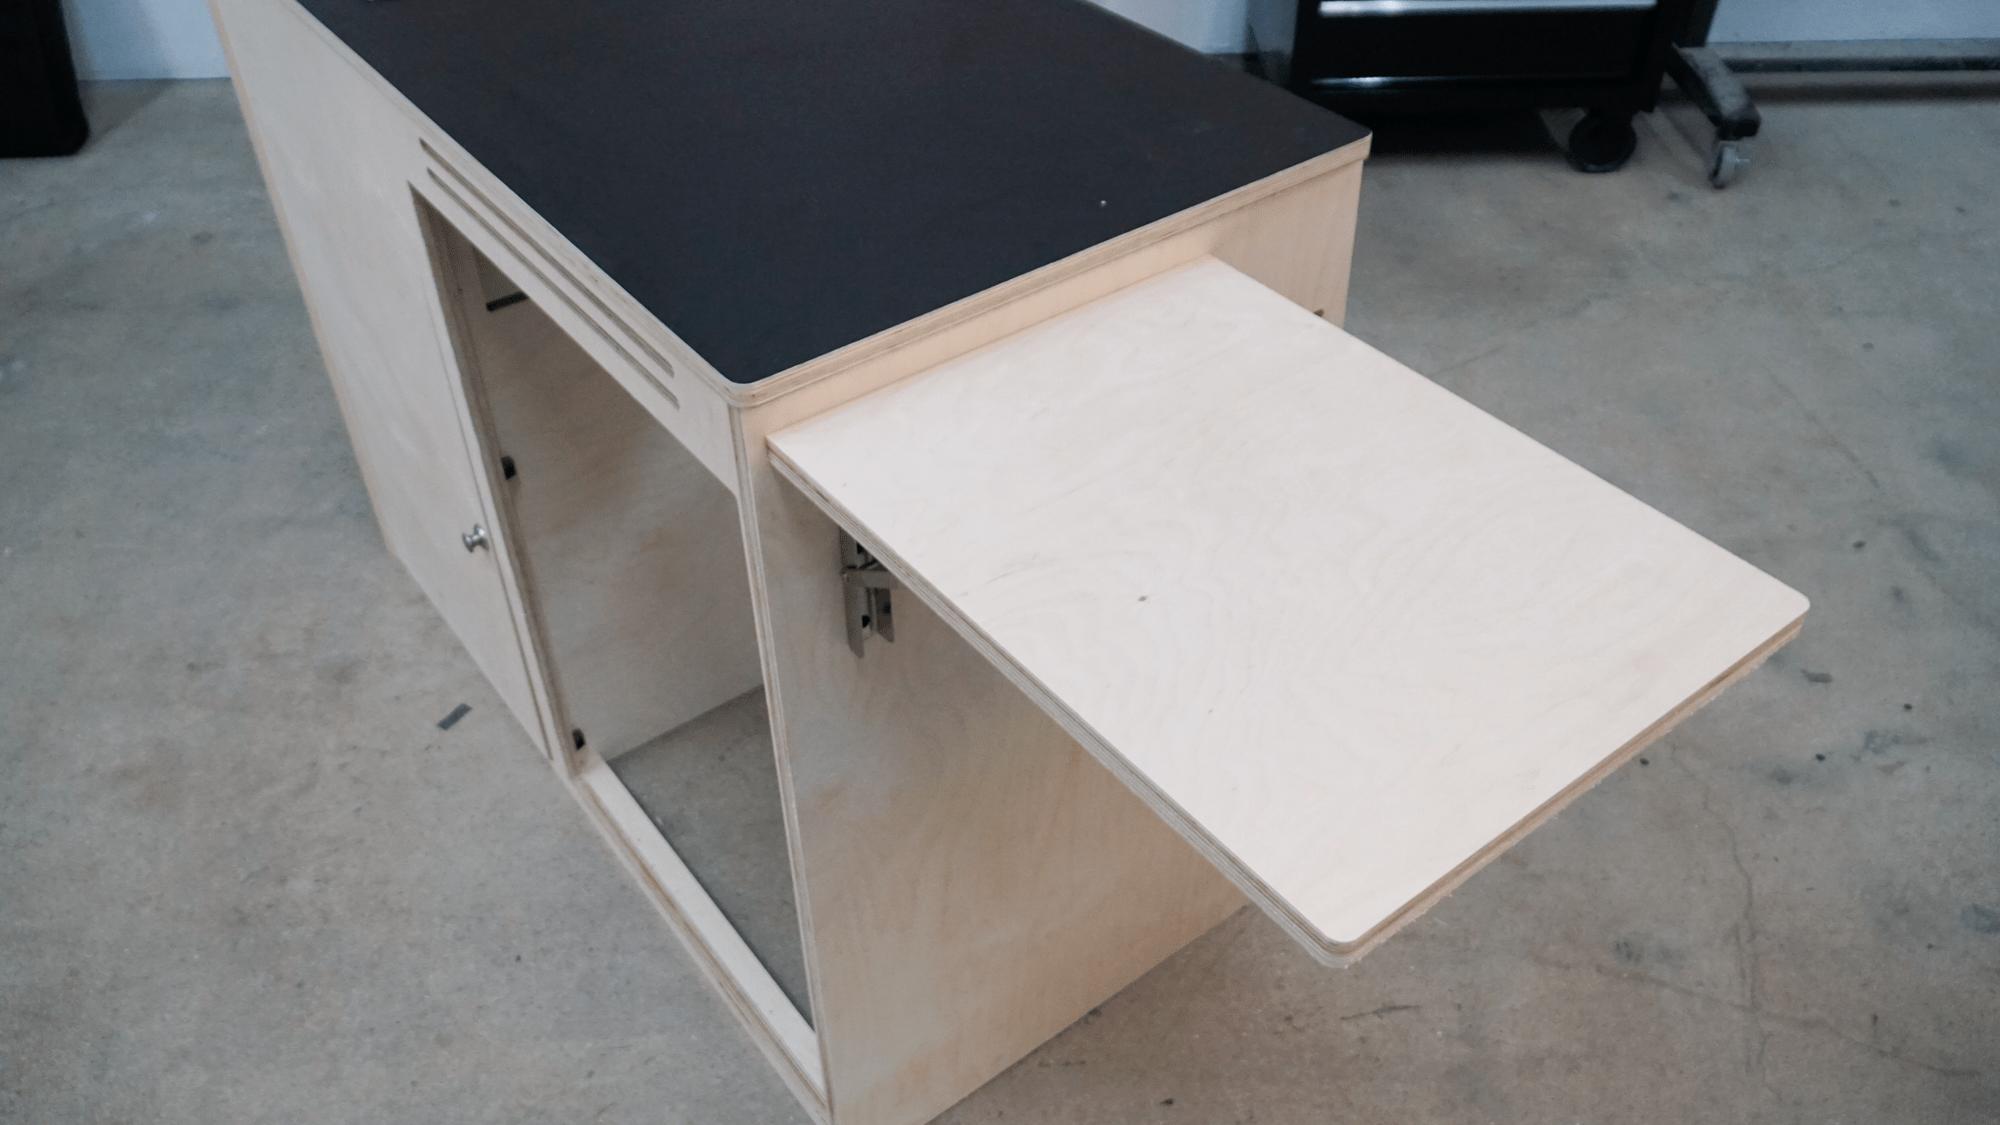 Flip up side table add on for van kitchen kit